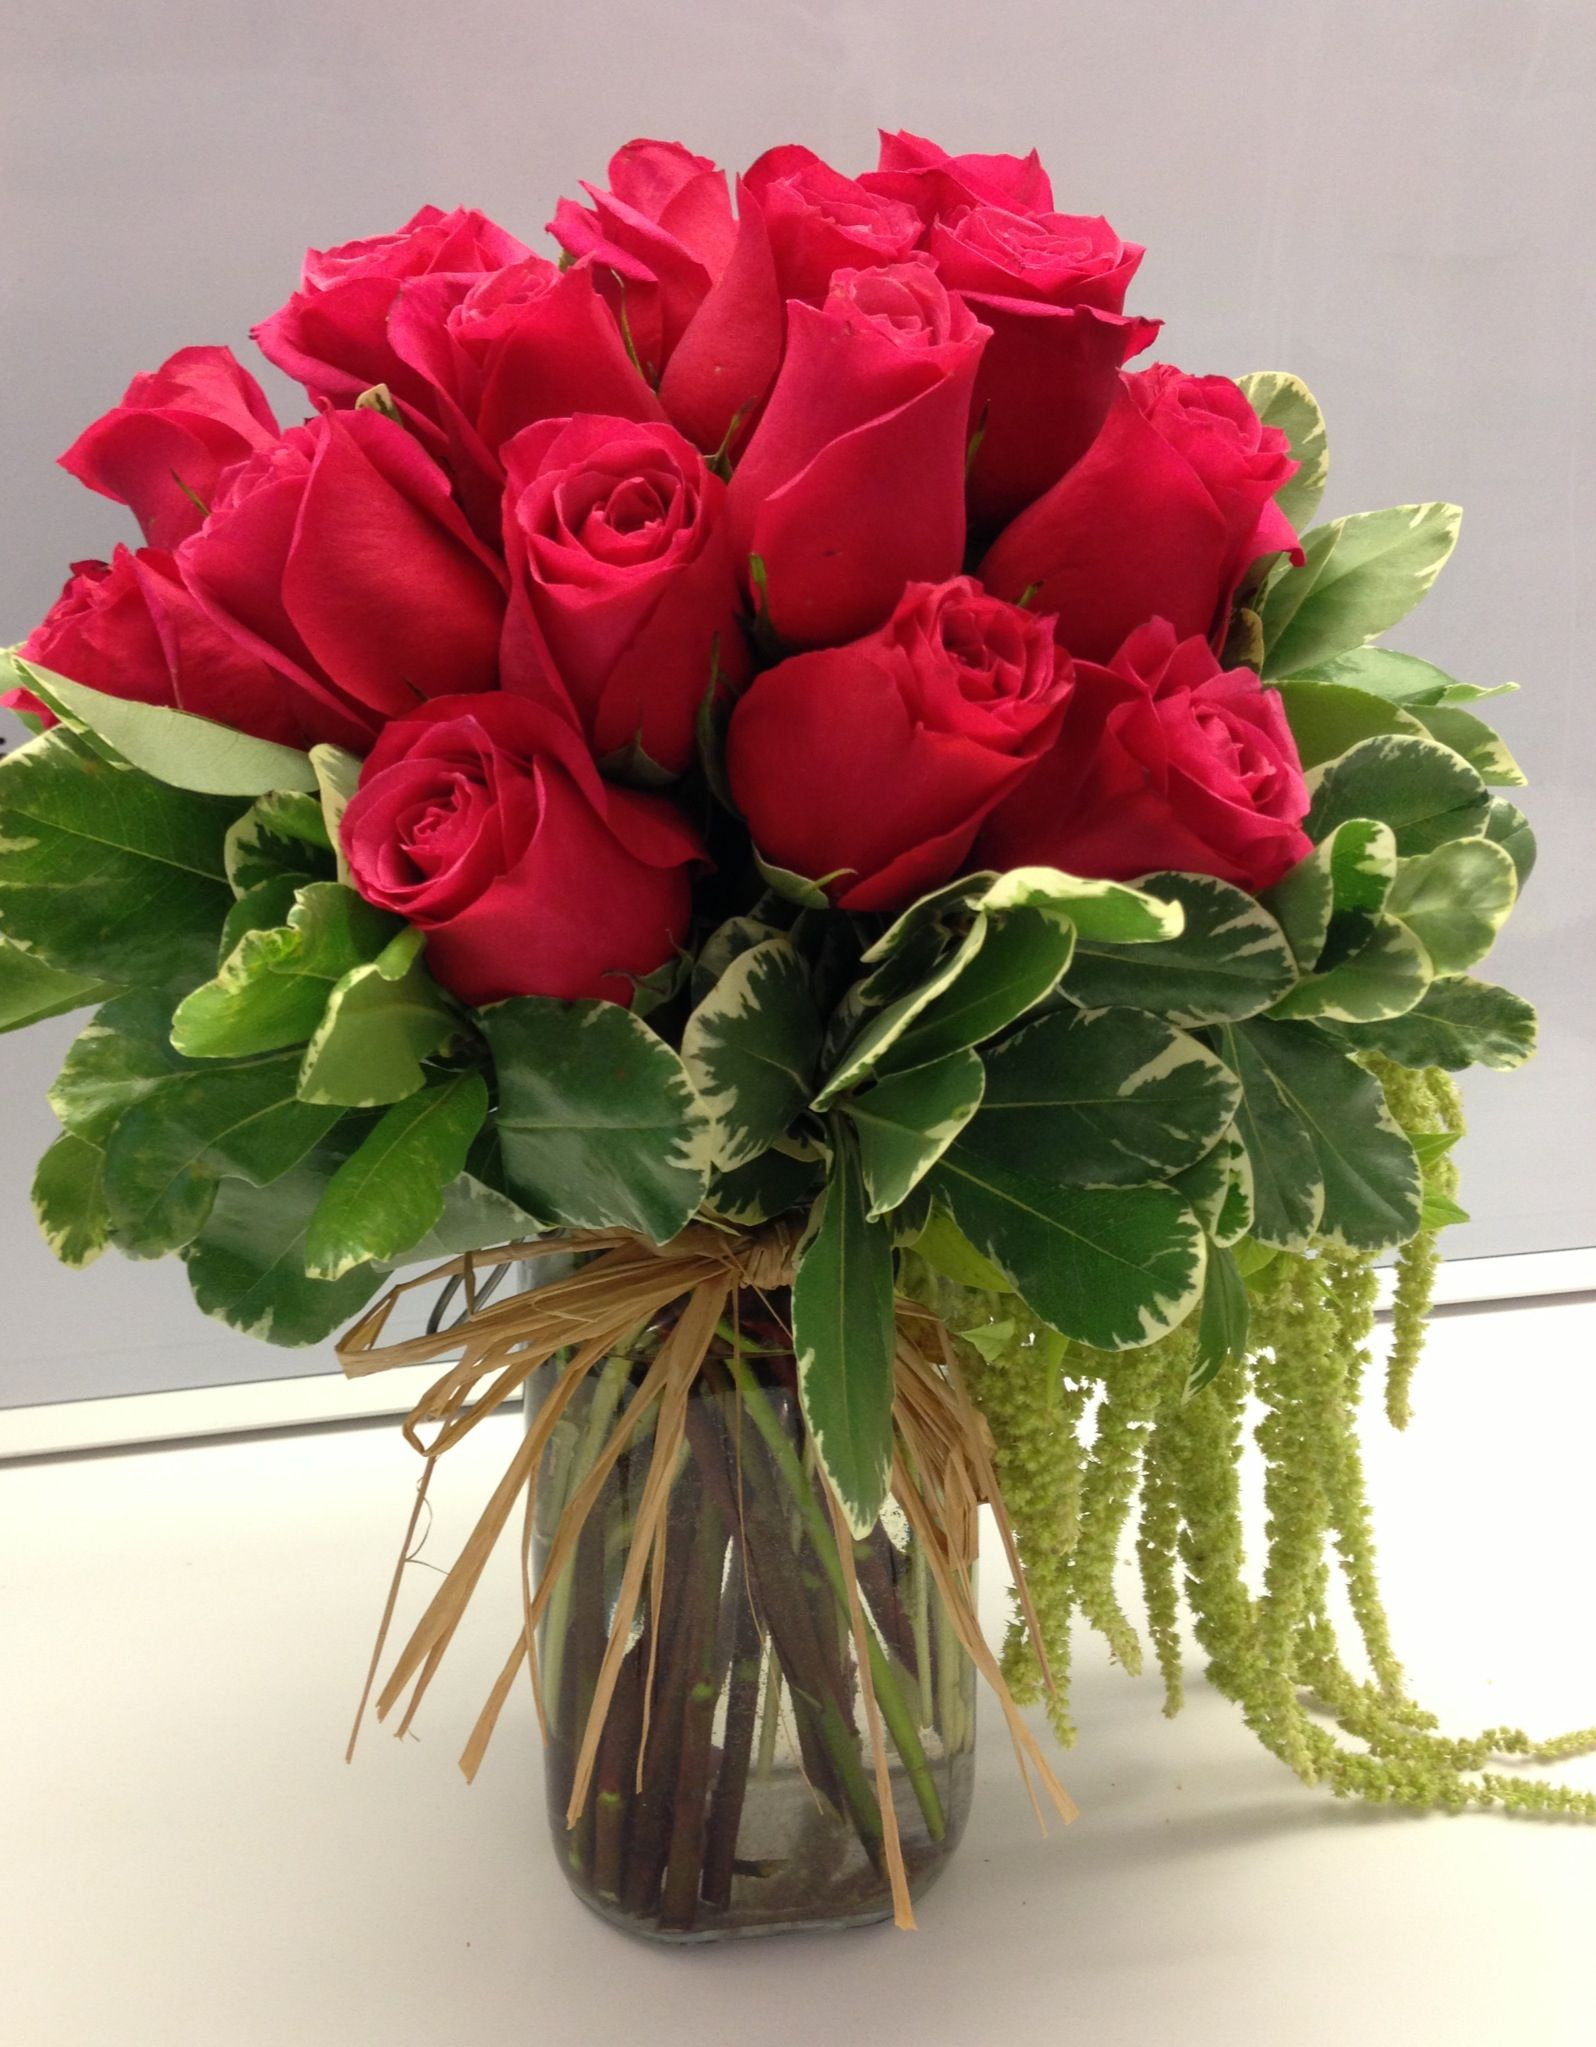 Rose arrangement floral garden ideas pinterest for Flower arrangements with roses